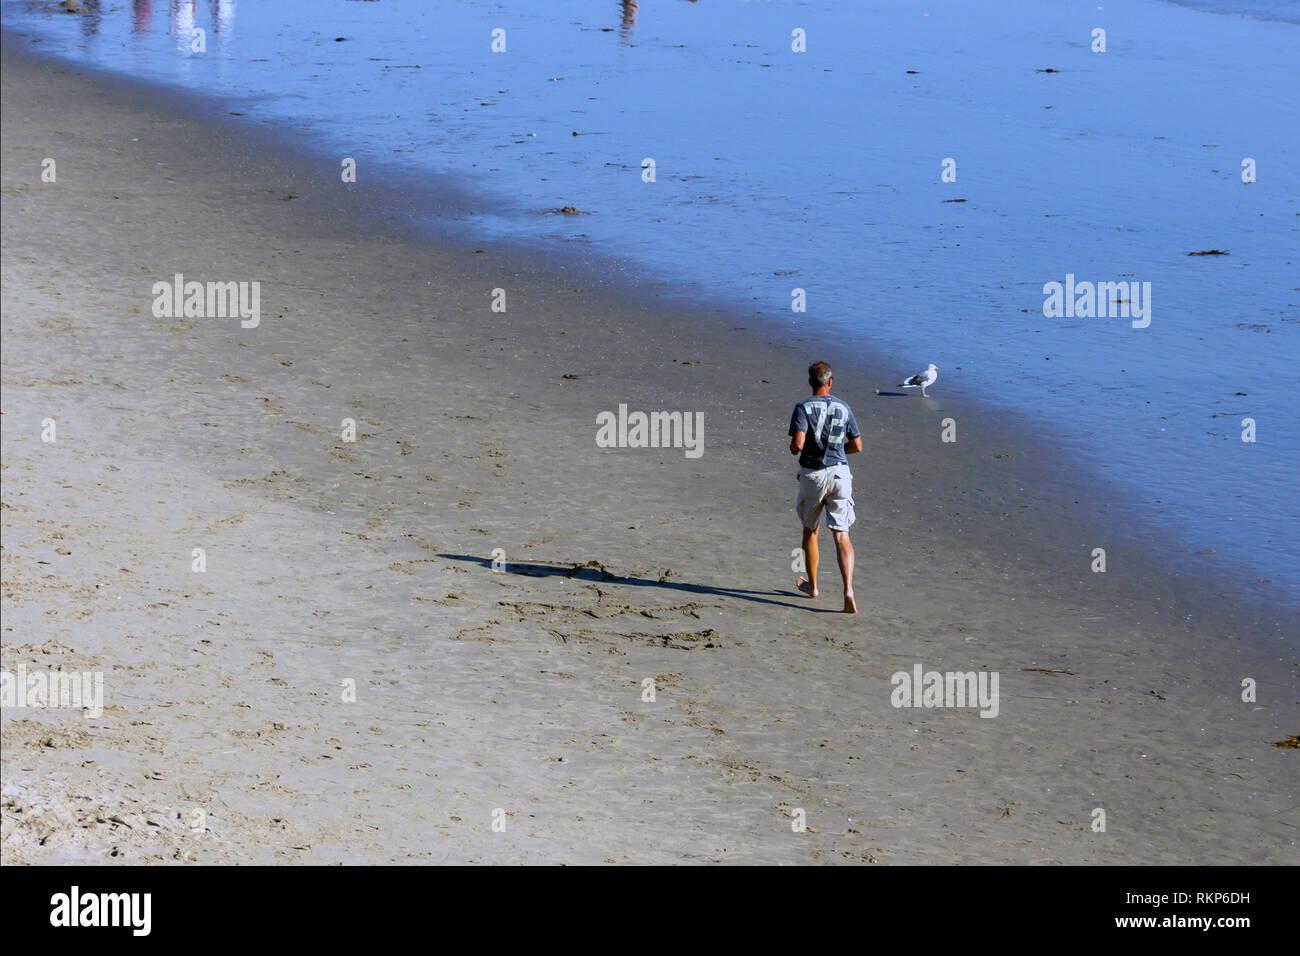 Hombre ejercitandose en la playa, Santa Monica, California Immagini Stock